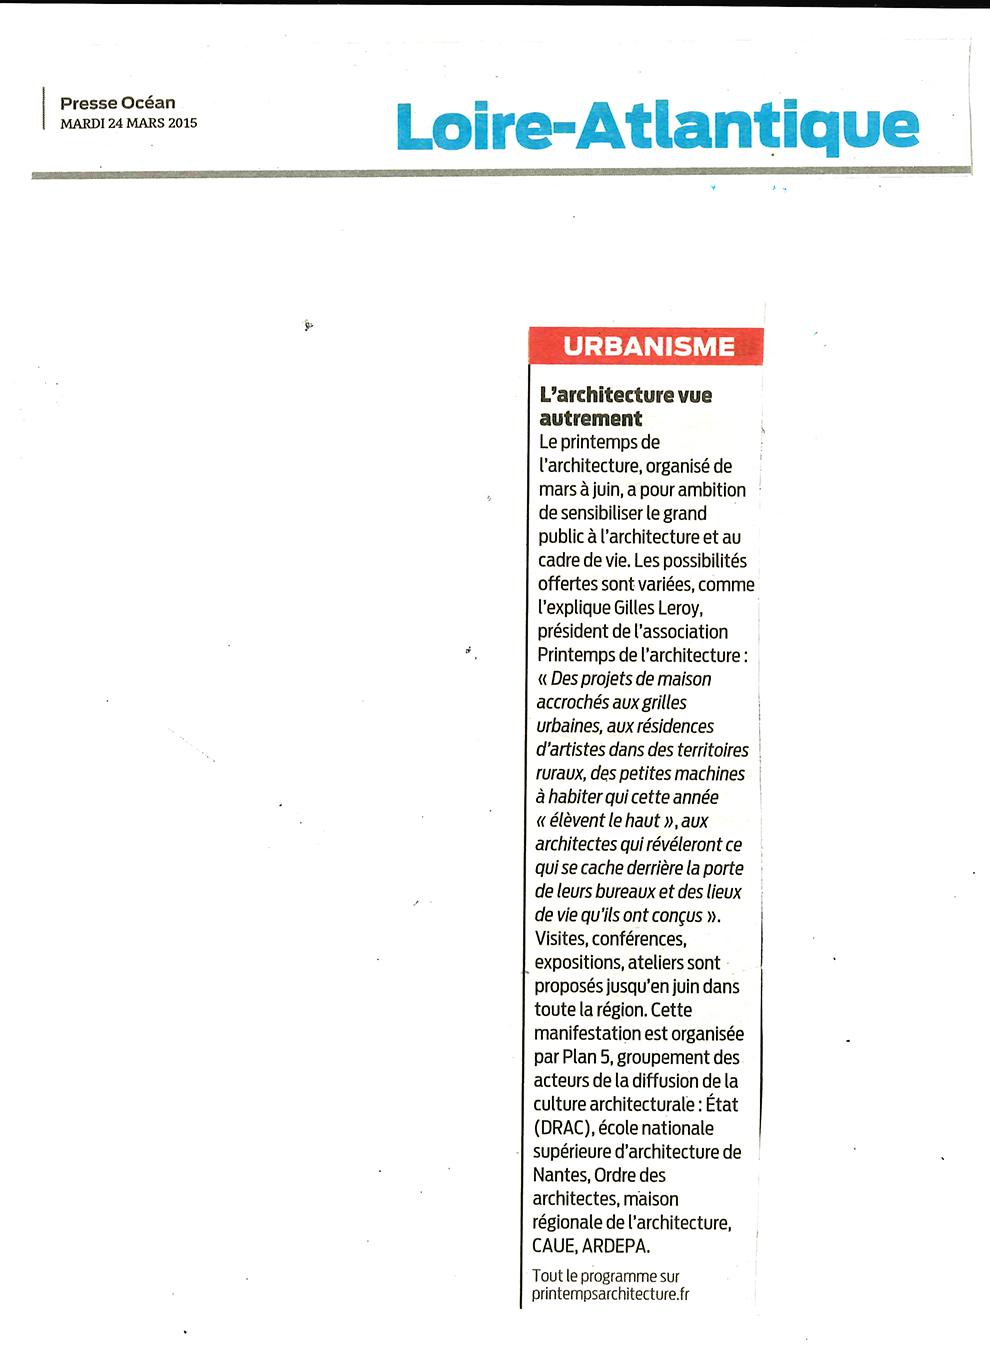 Presse Océan, mardi 24 mars : presse